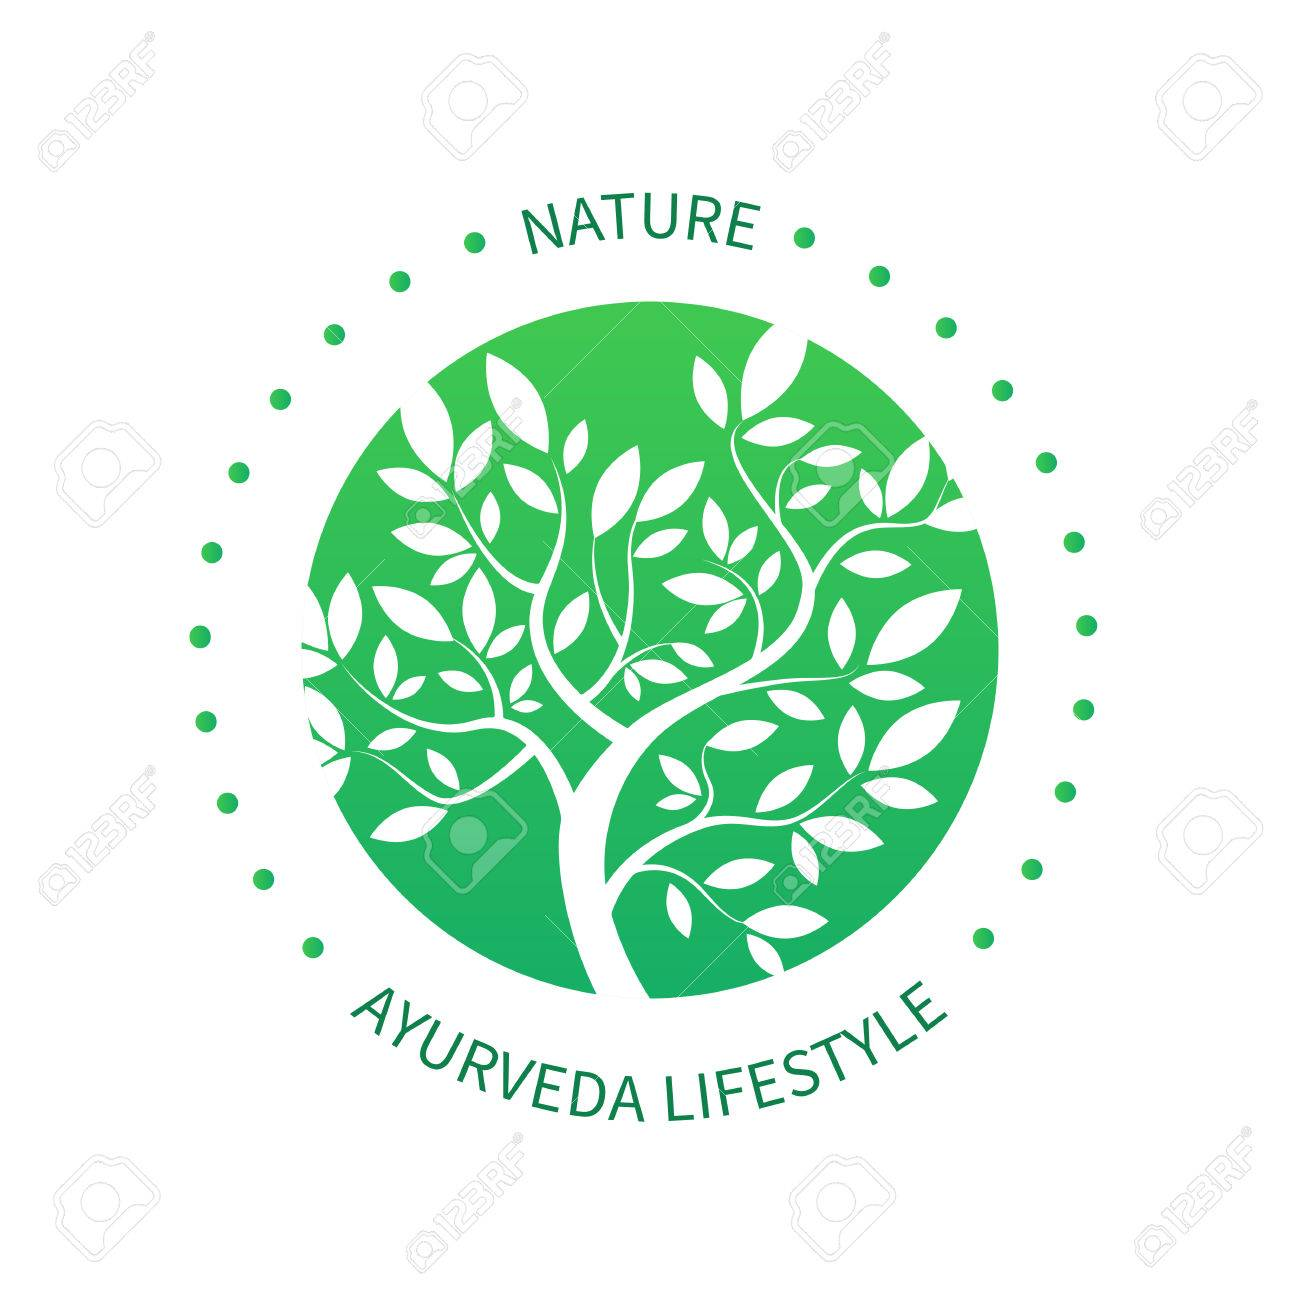 Ayurvedic tree icon, alternative medicine icon isolated on white. - 59070988